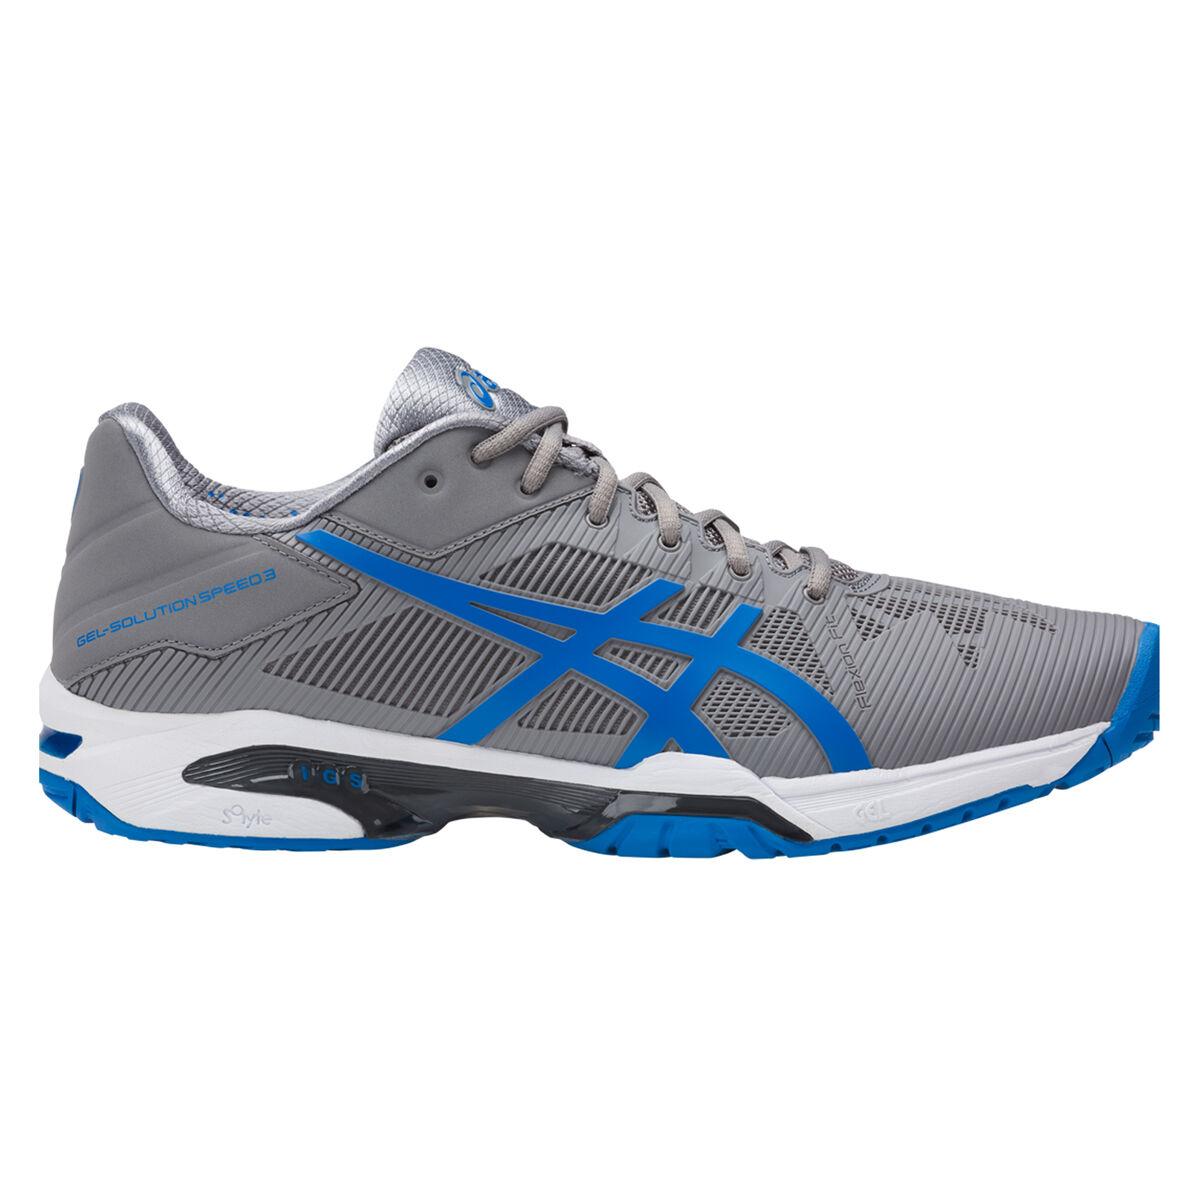 online store 7a9db 94099 Images. Asics GEL-Solution Speed 3 Men  39 s Tennis Shoe - Grey